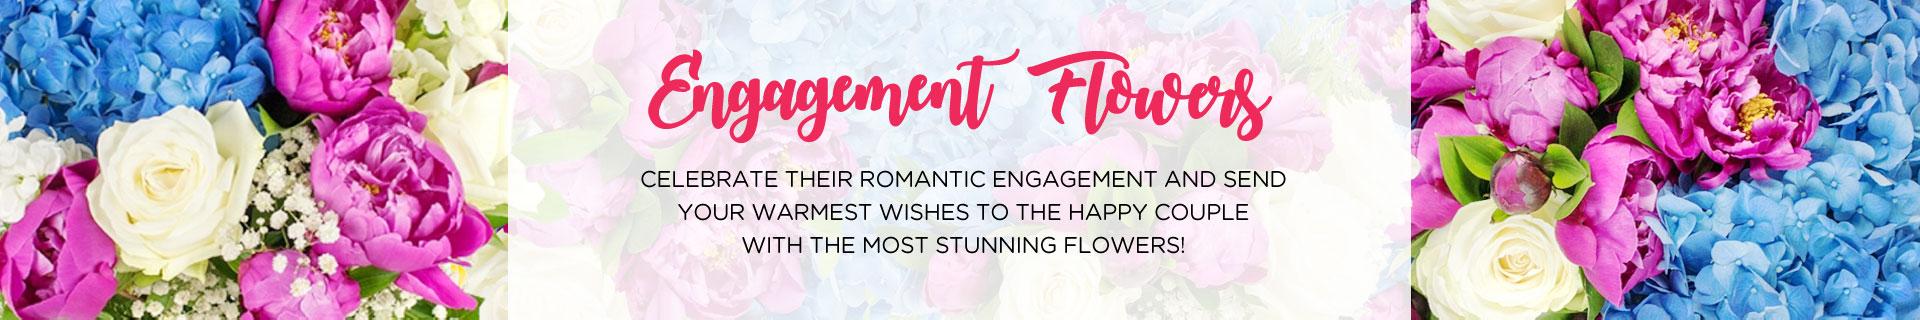 Engagement Flowers